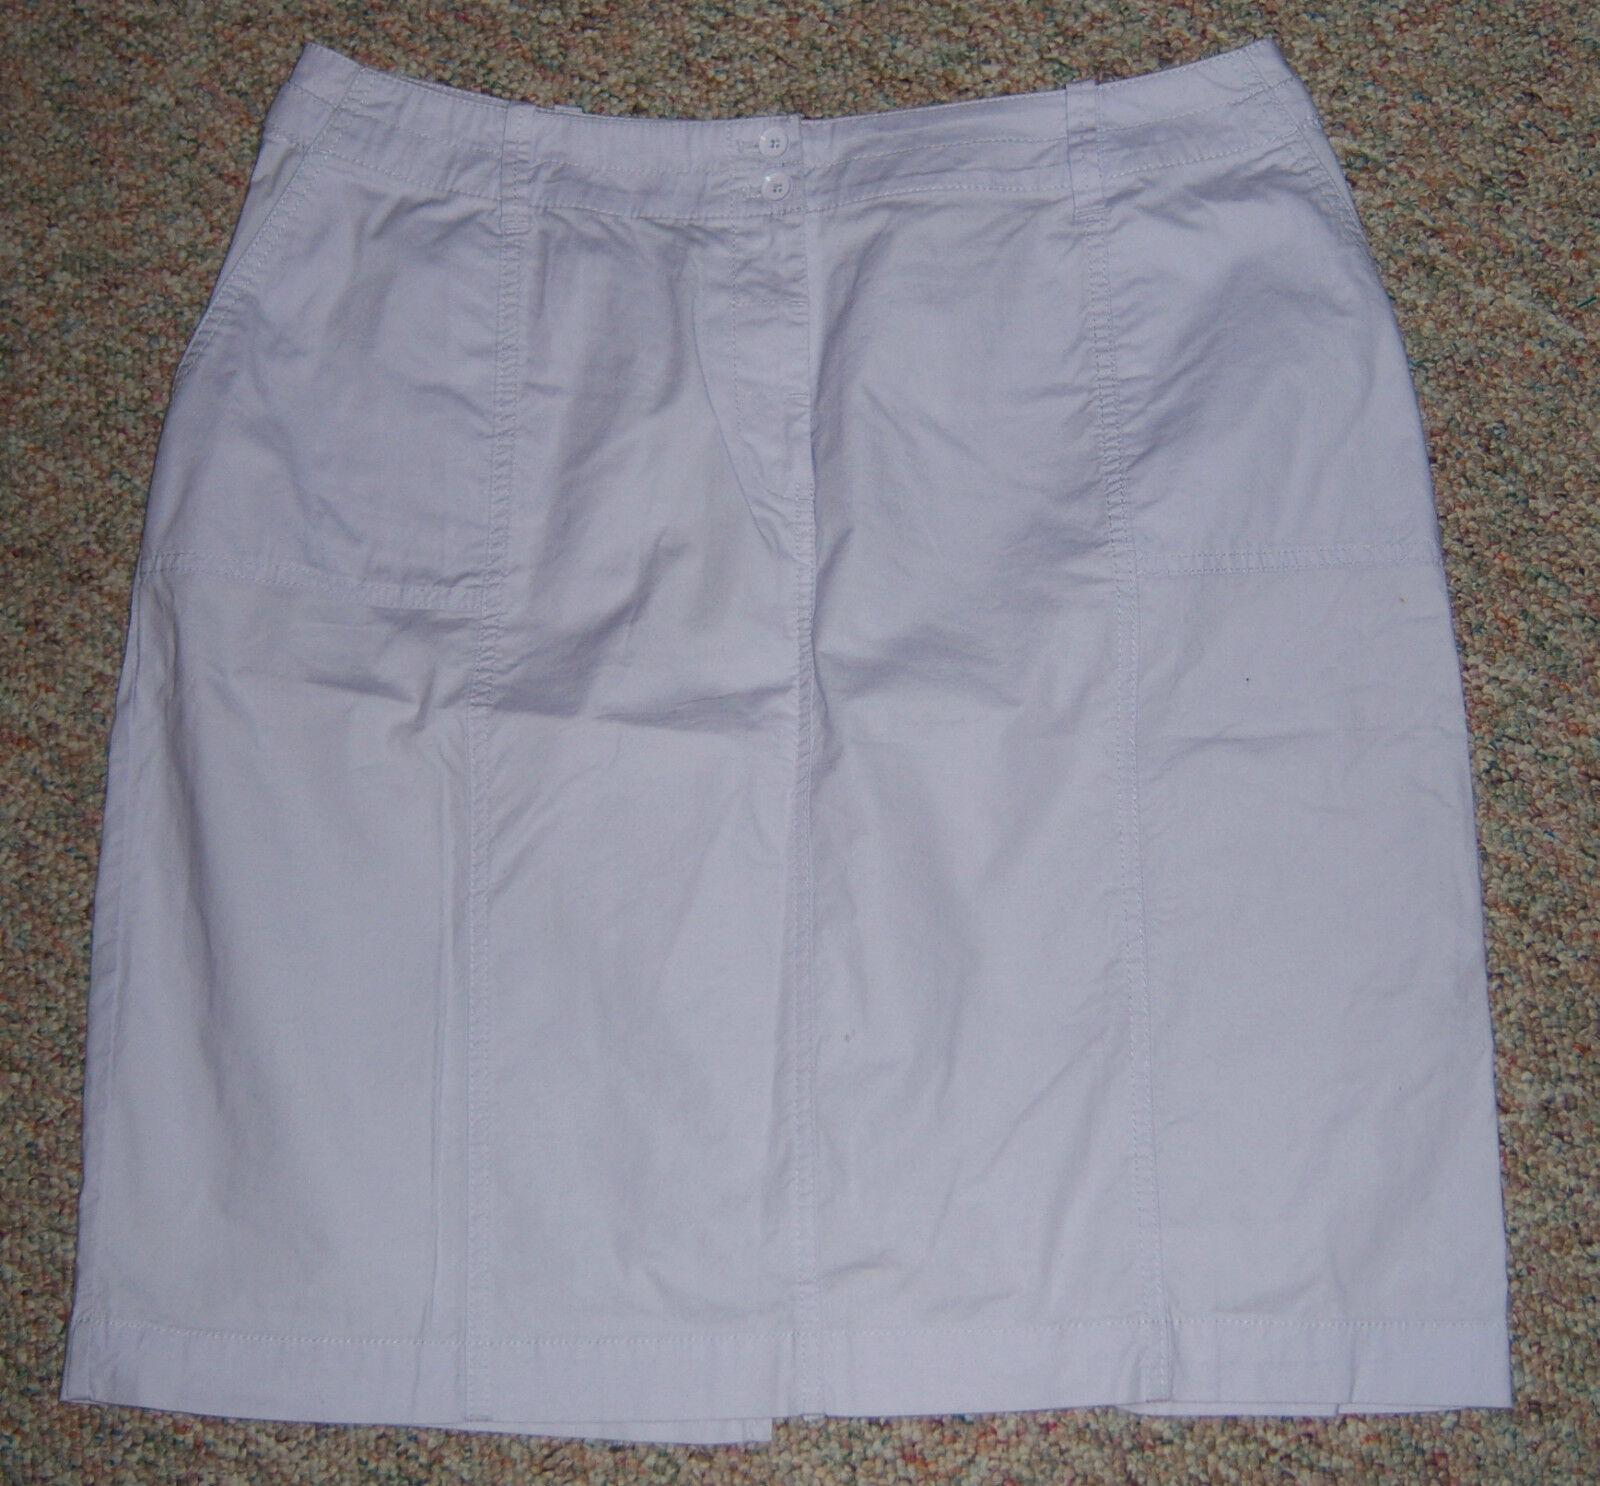 TALBOTS purplec color Below Knee Lightweight Casual Skirt 14 Woman Petite or 14WP